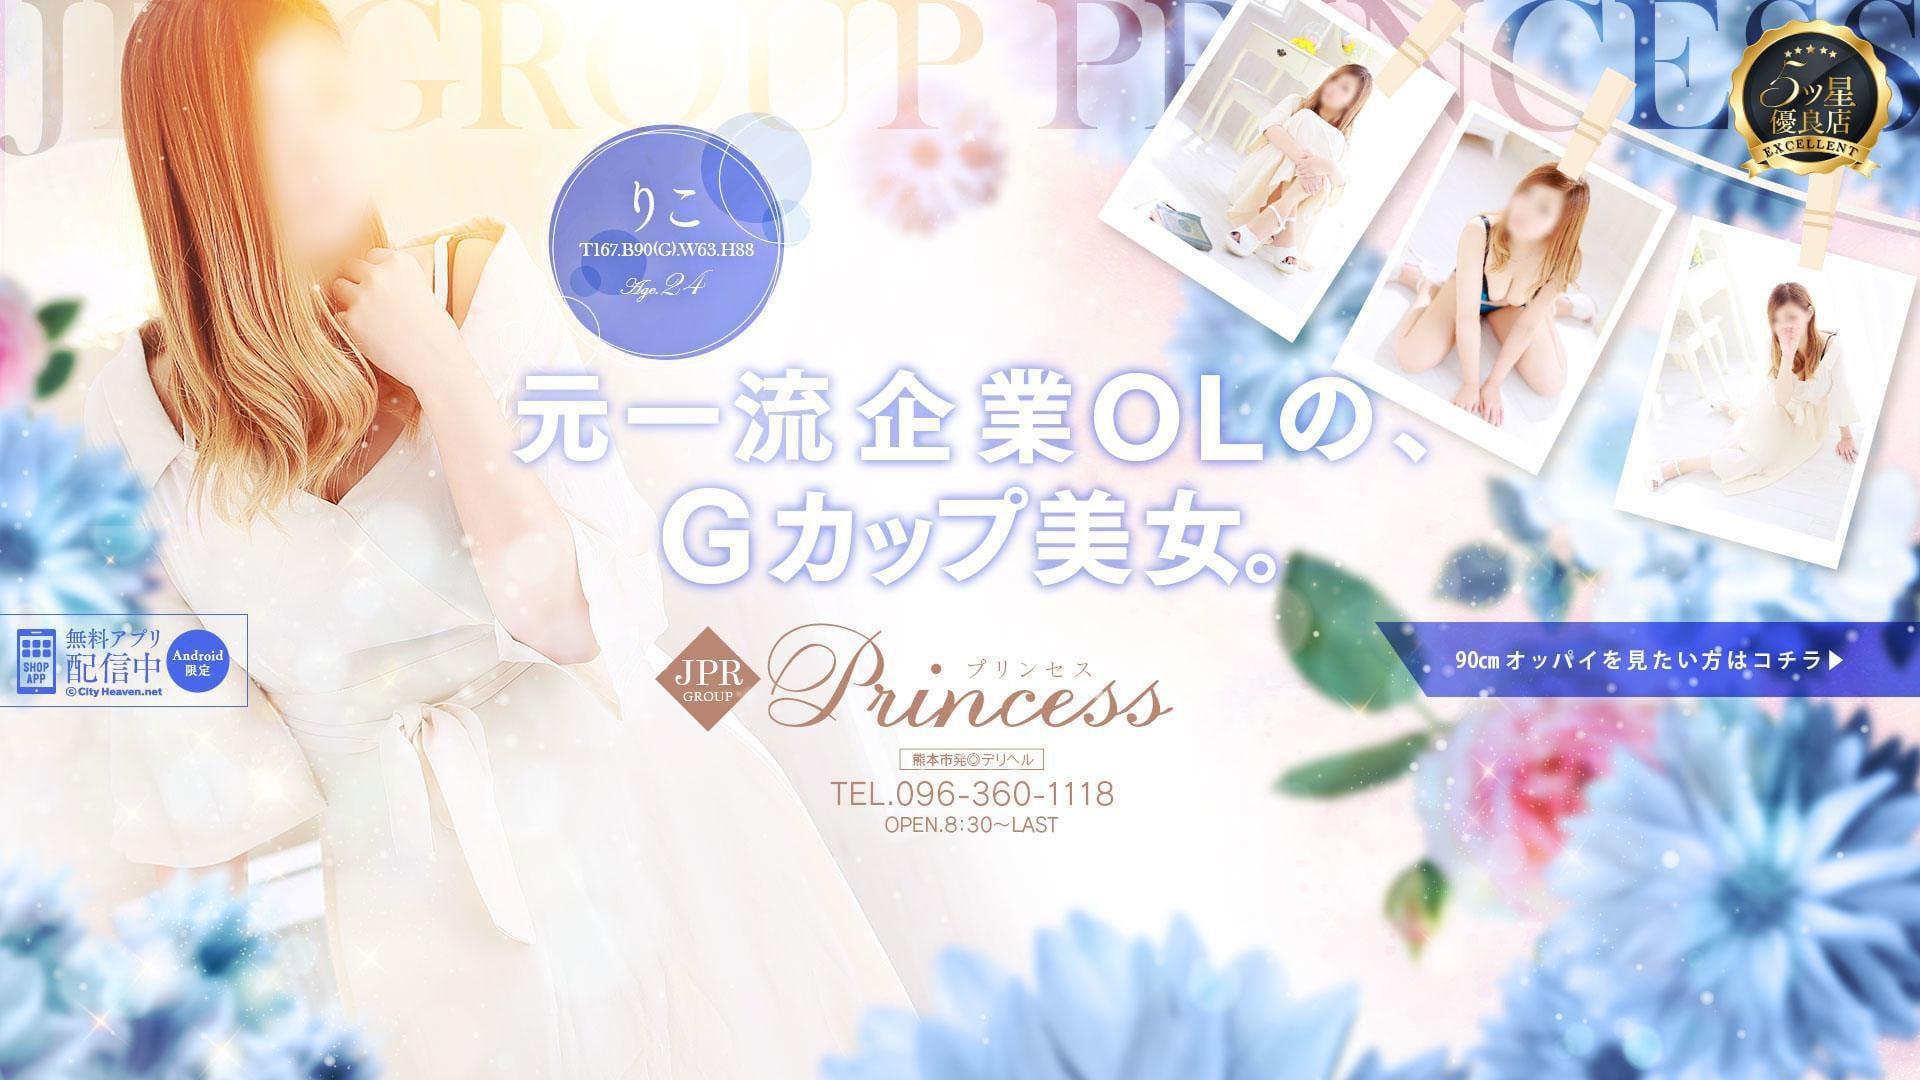 JPRグループ 素人専門店 Princess(プリンセス)